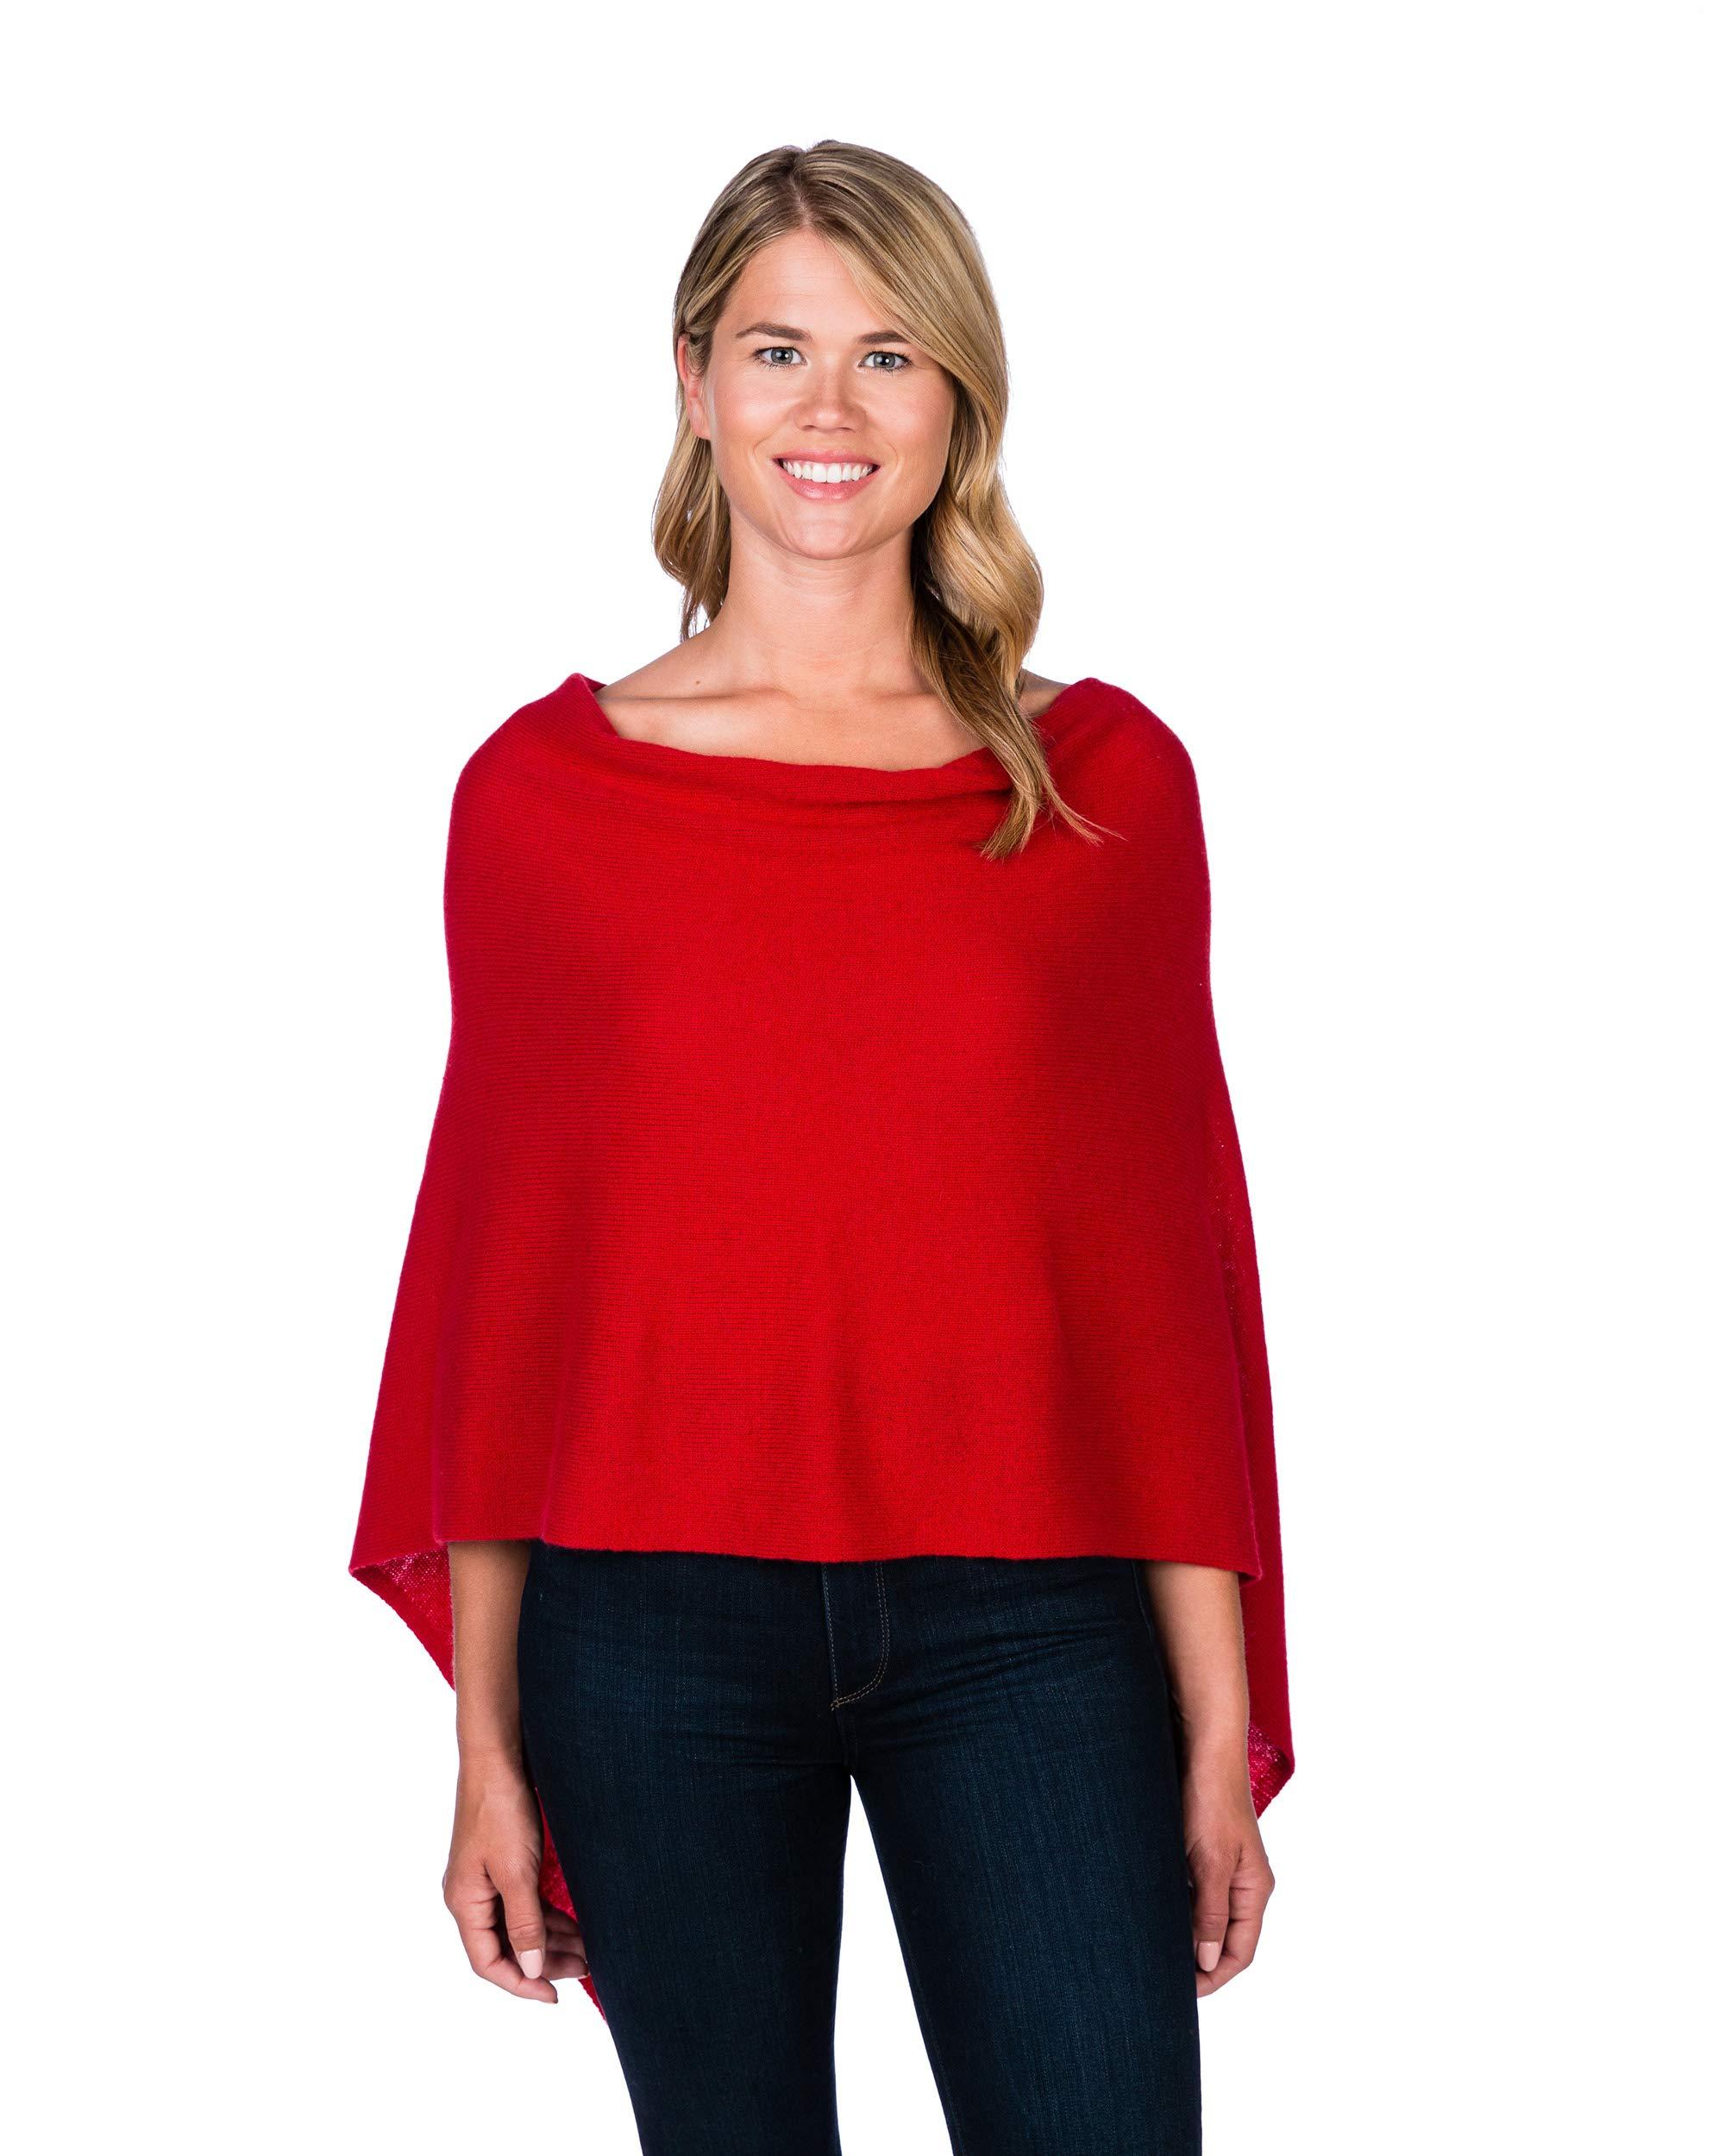 Alashan Cashmere Claudia Nichole Cashmere Draped Dress Topper - Crimson/459